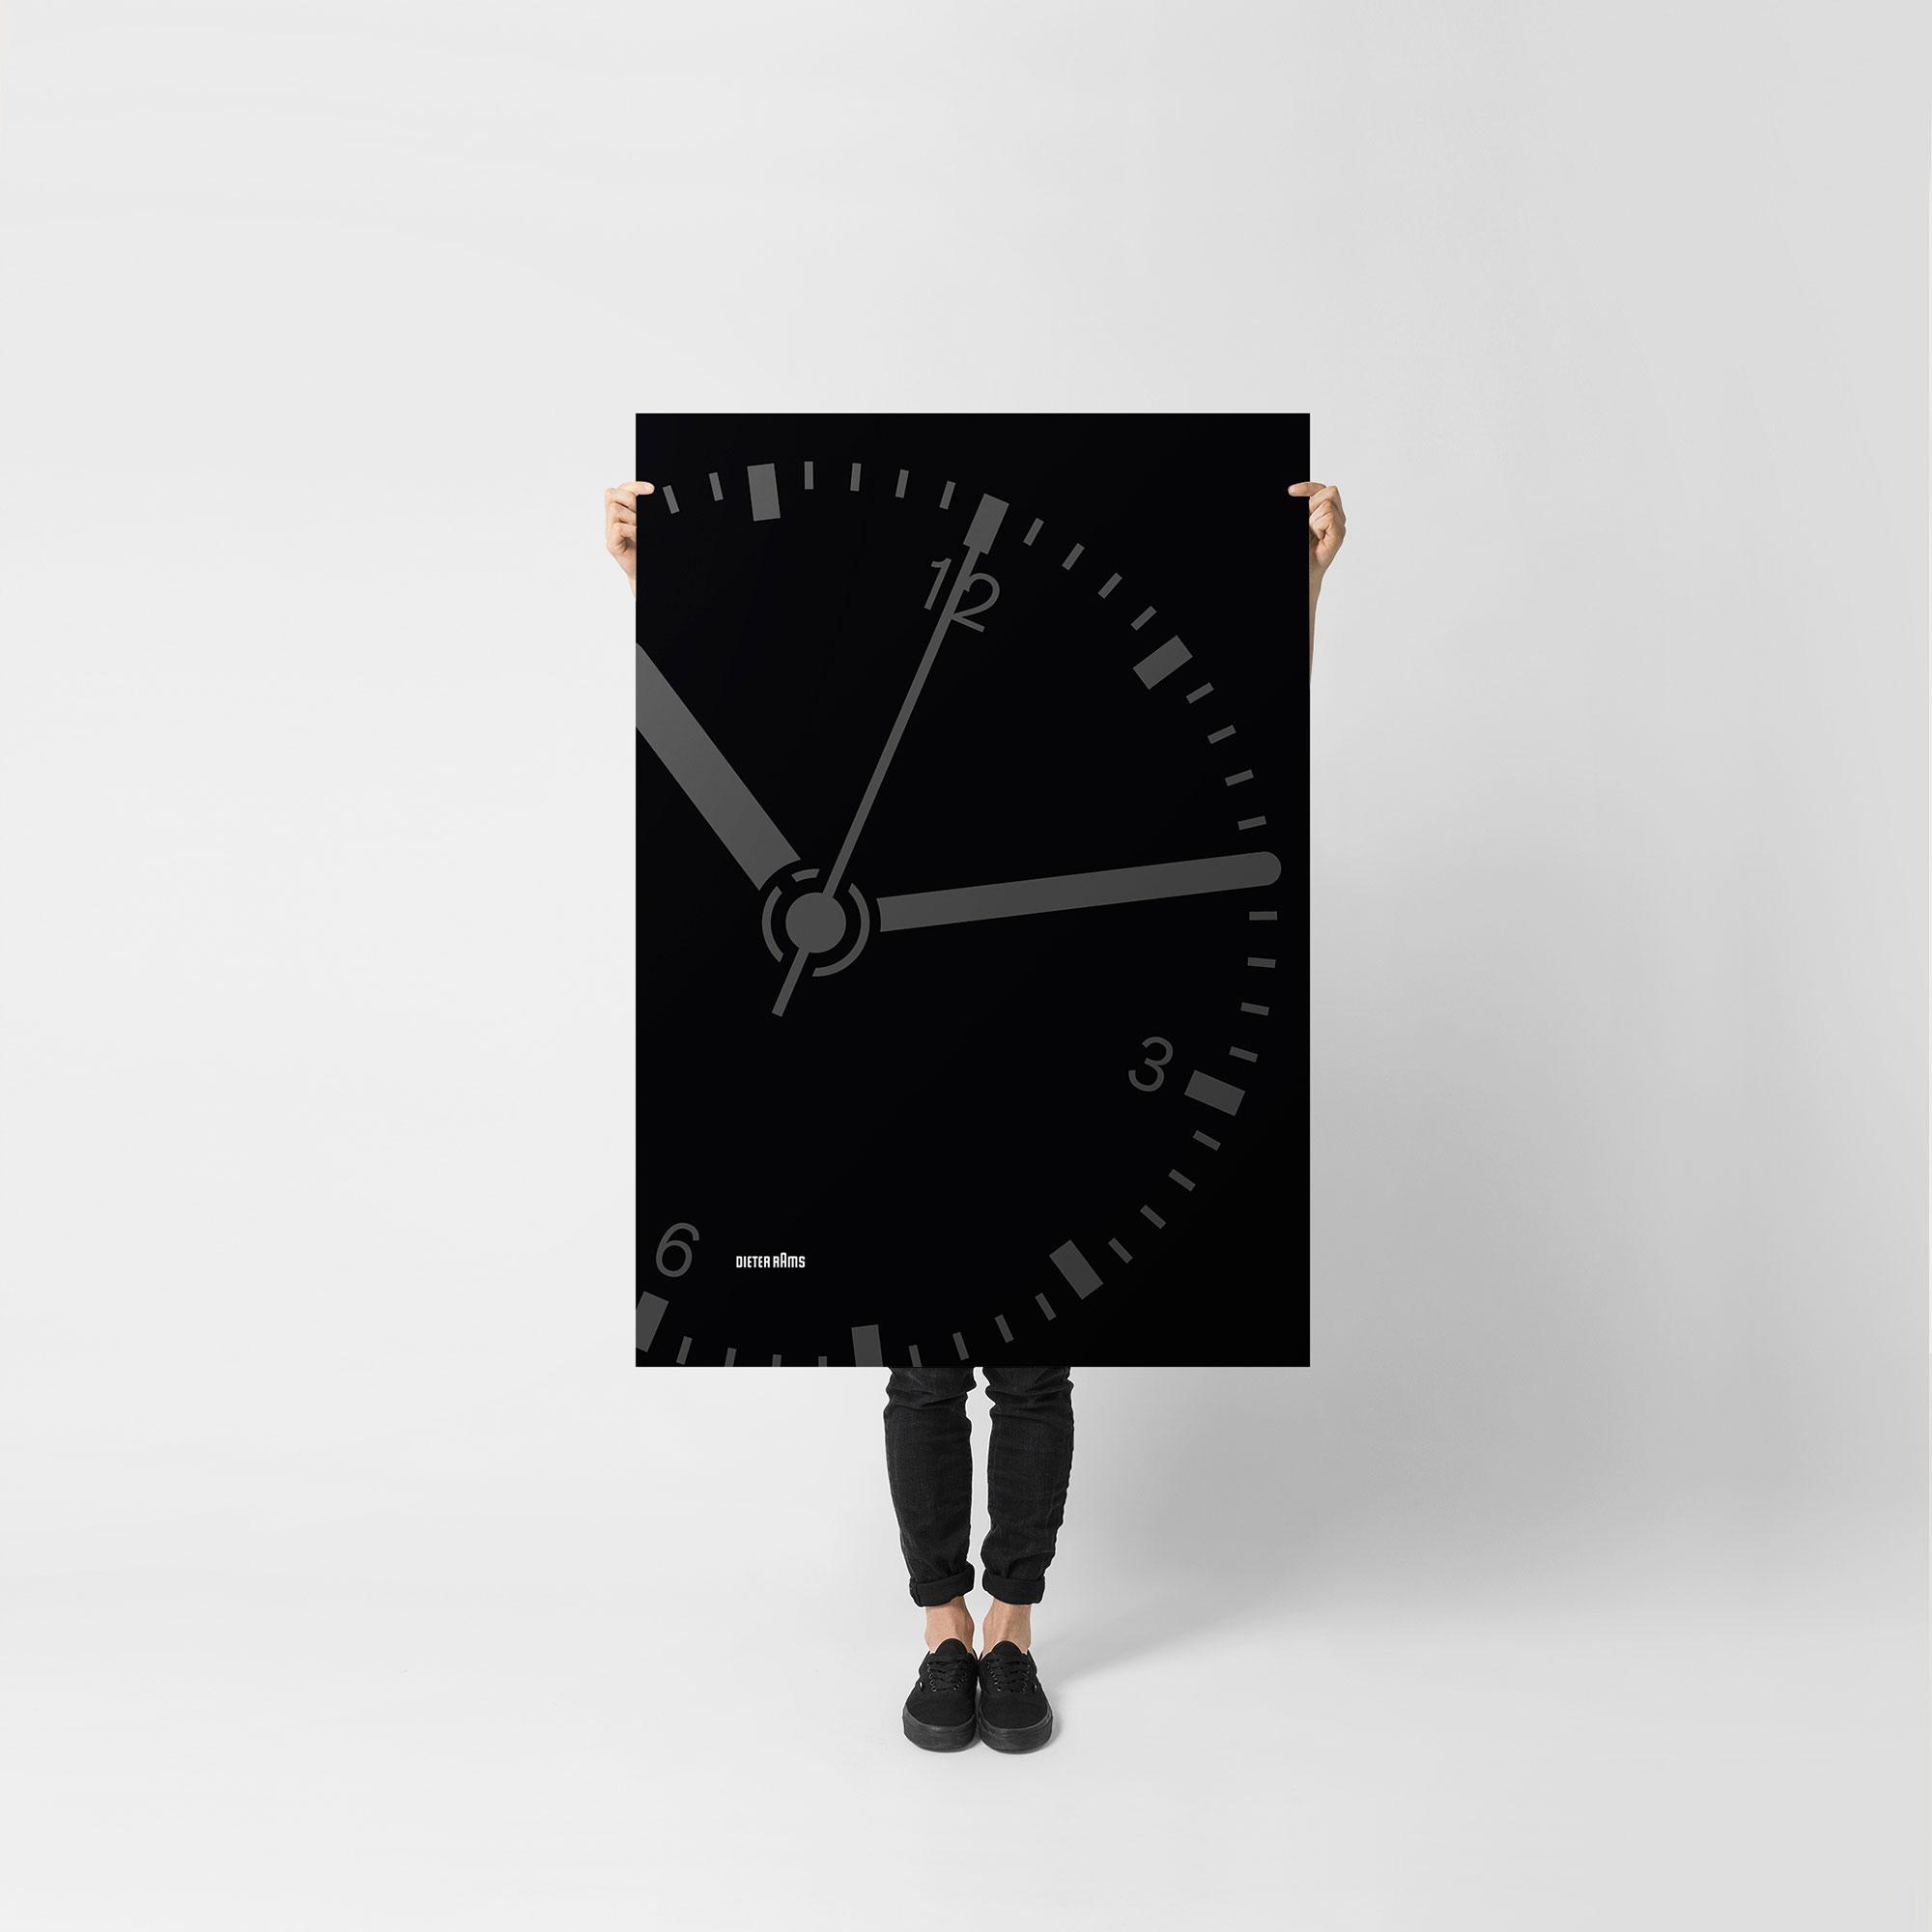 Braun clock by Dieter Rams Illustration Poster Giclée Print